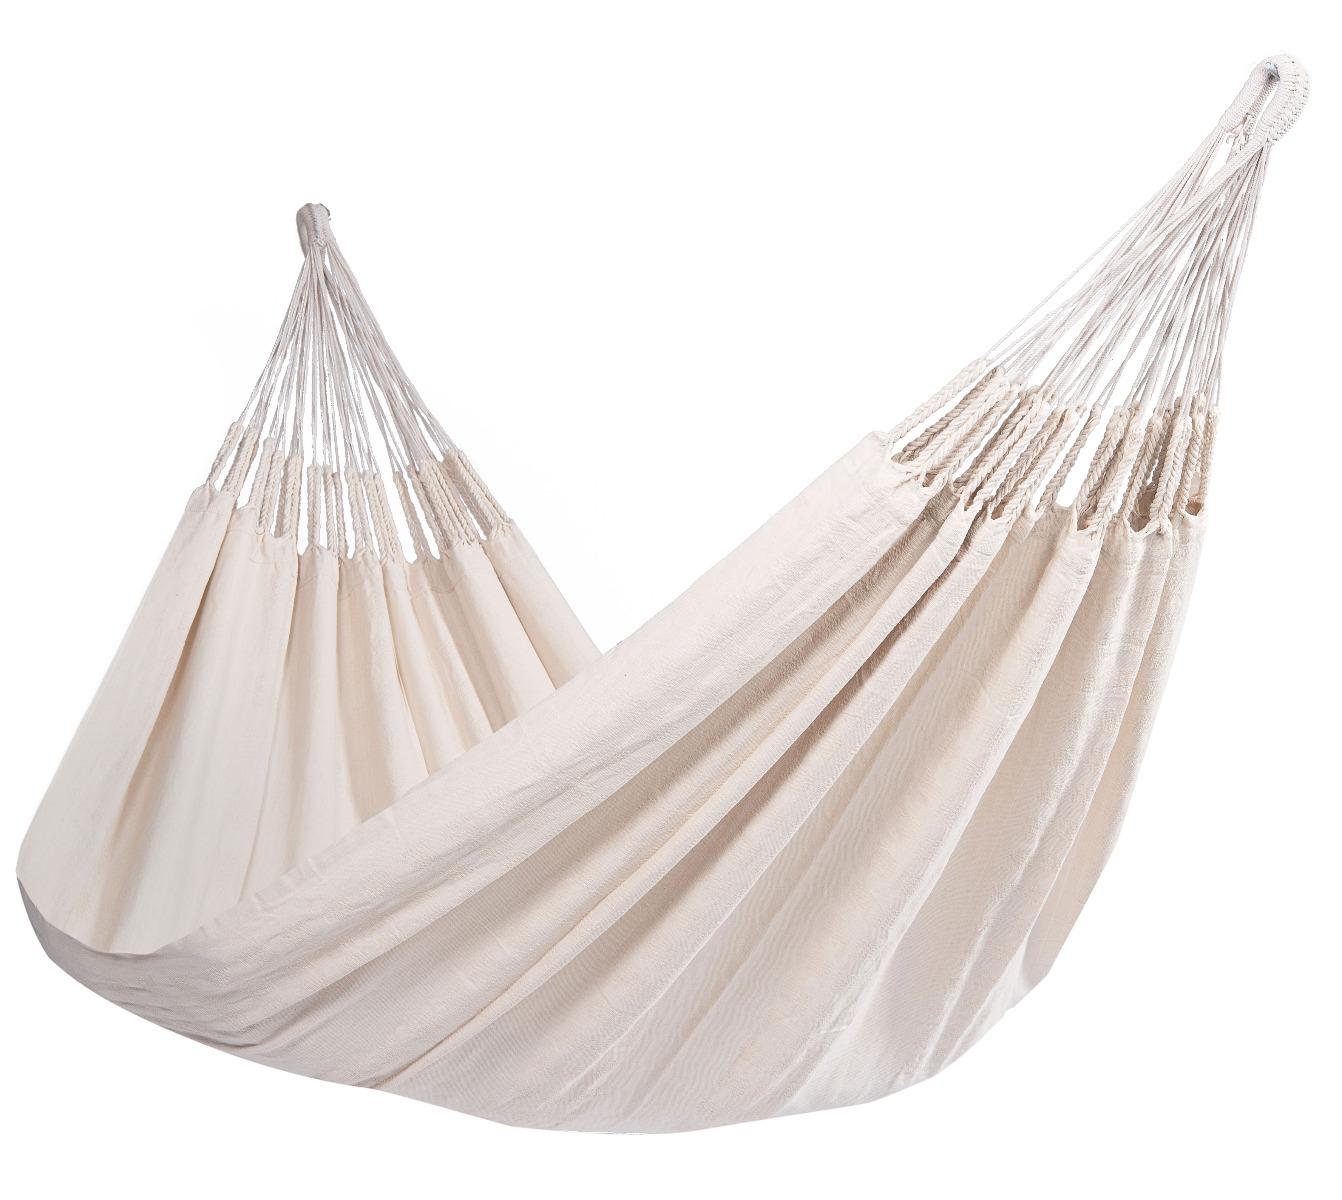 Hangmat 'Comfort' White - Tropilex �